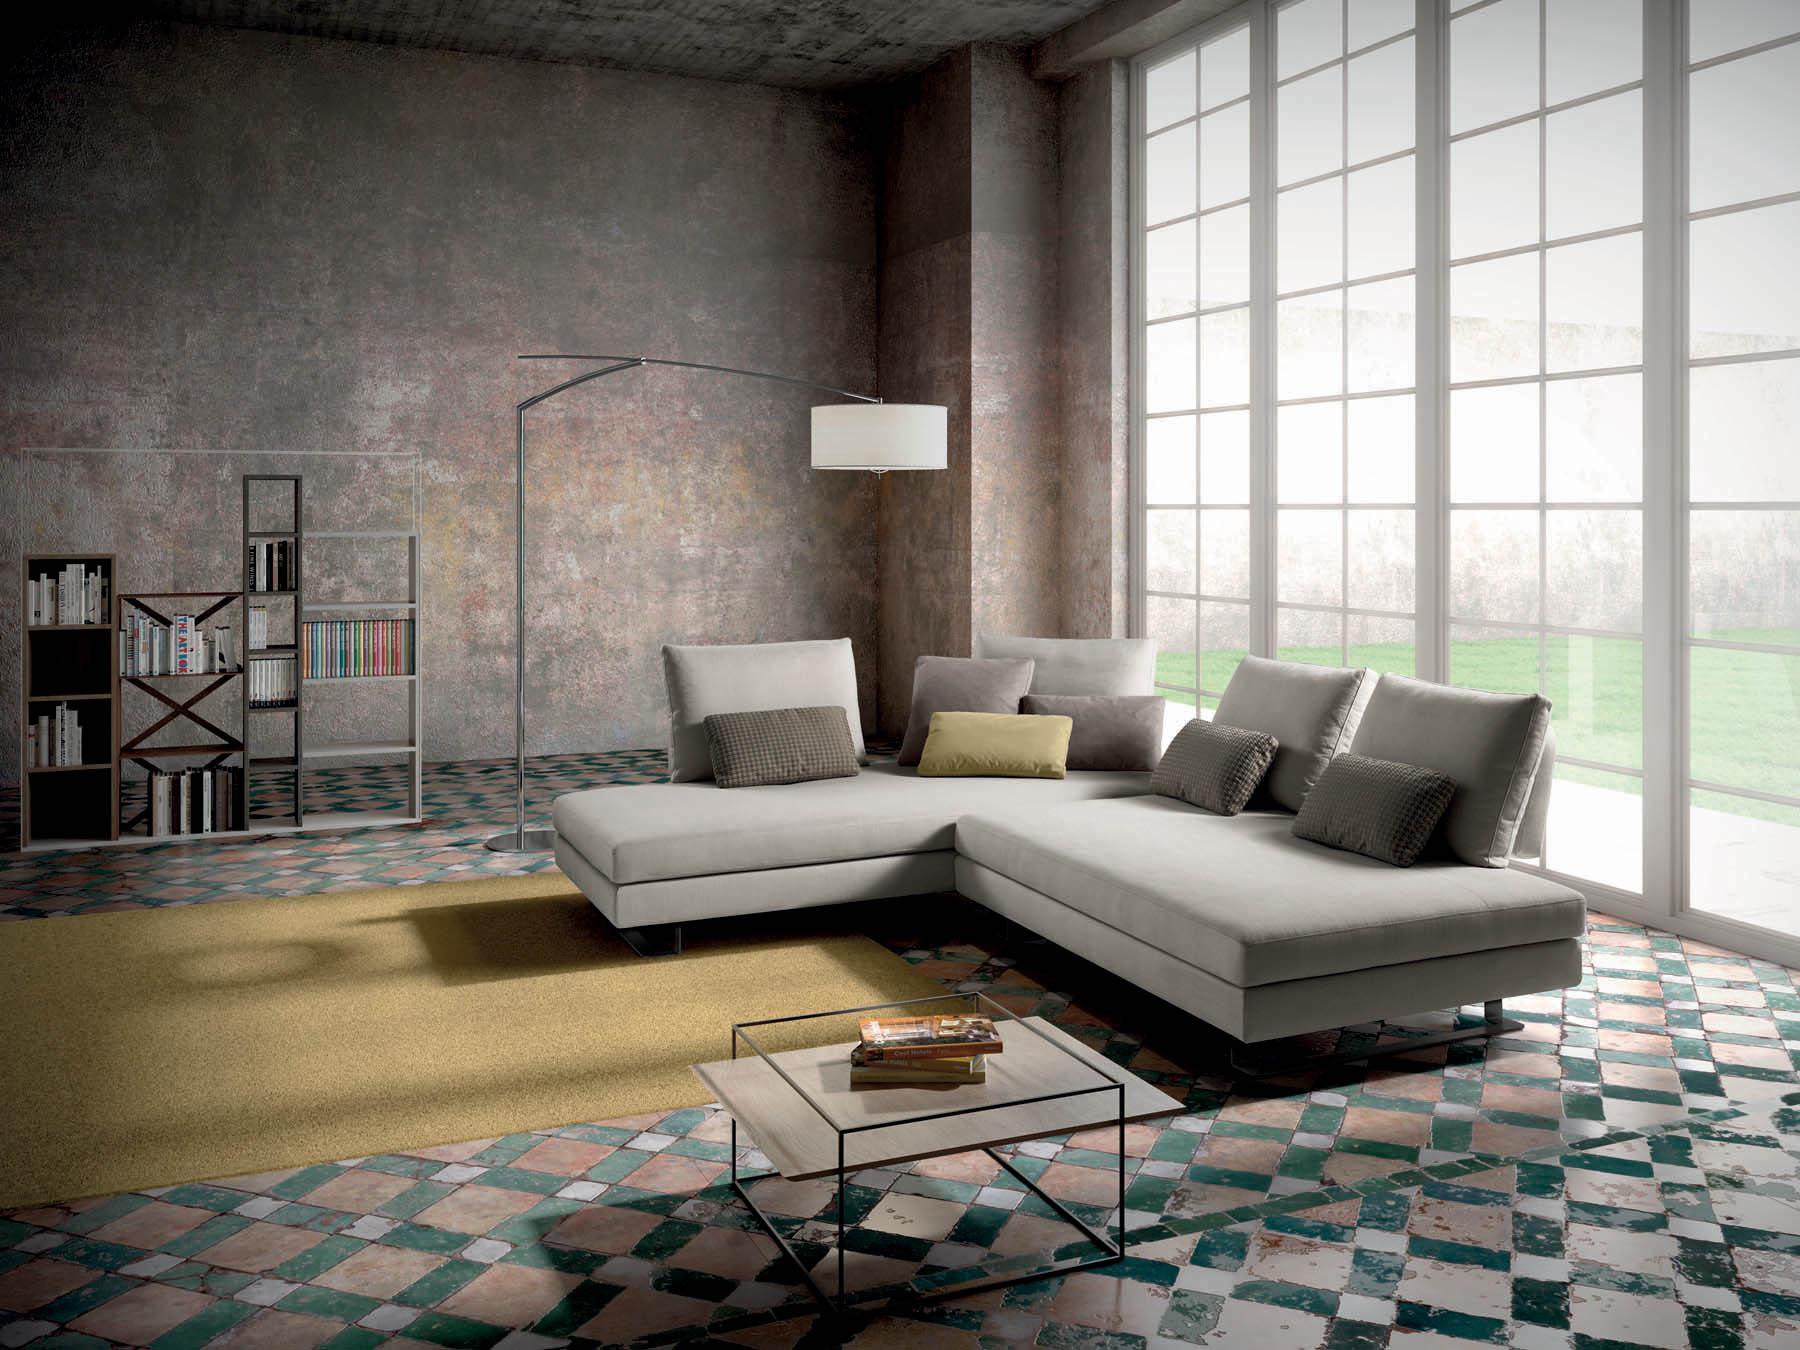 samoa harmony mobilia group divani cucine eForMobilia Buttrio